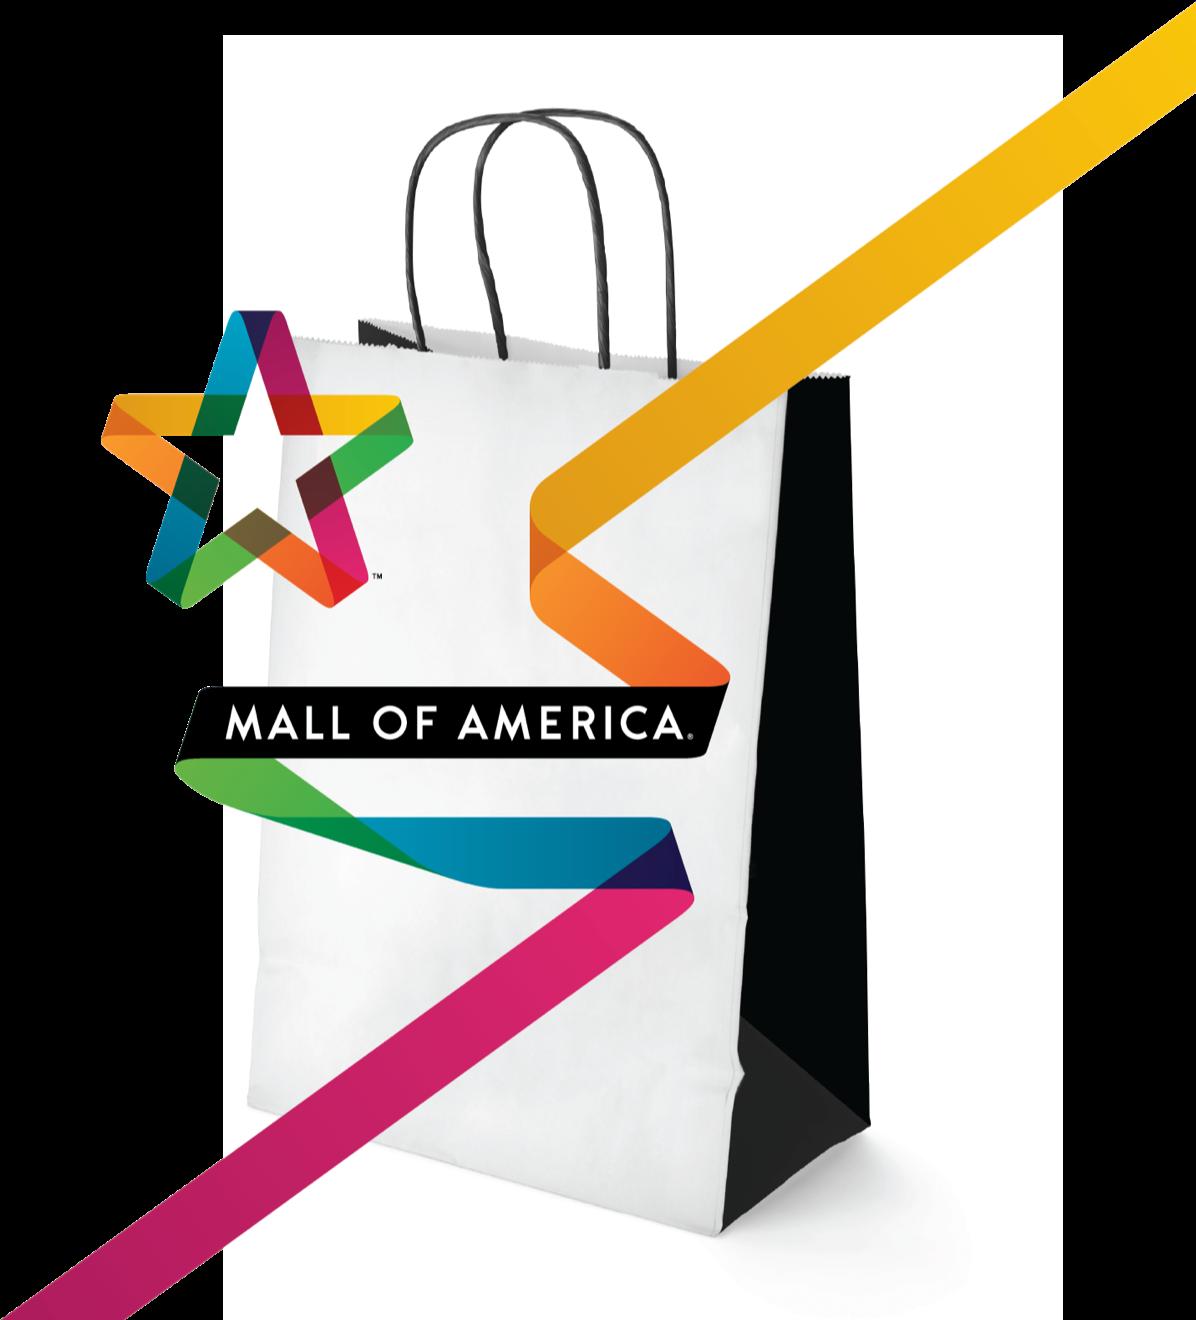 Mall of America image